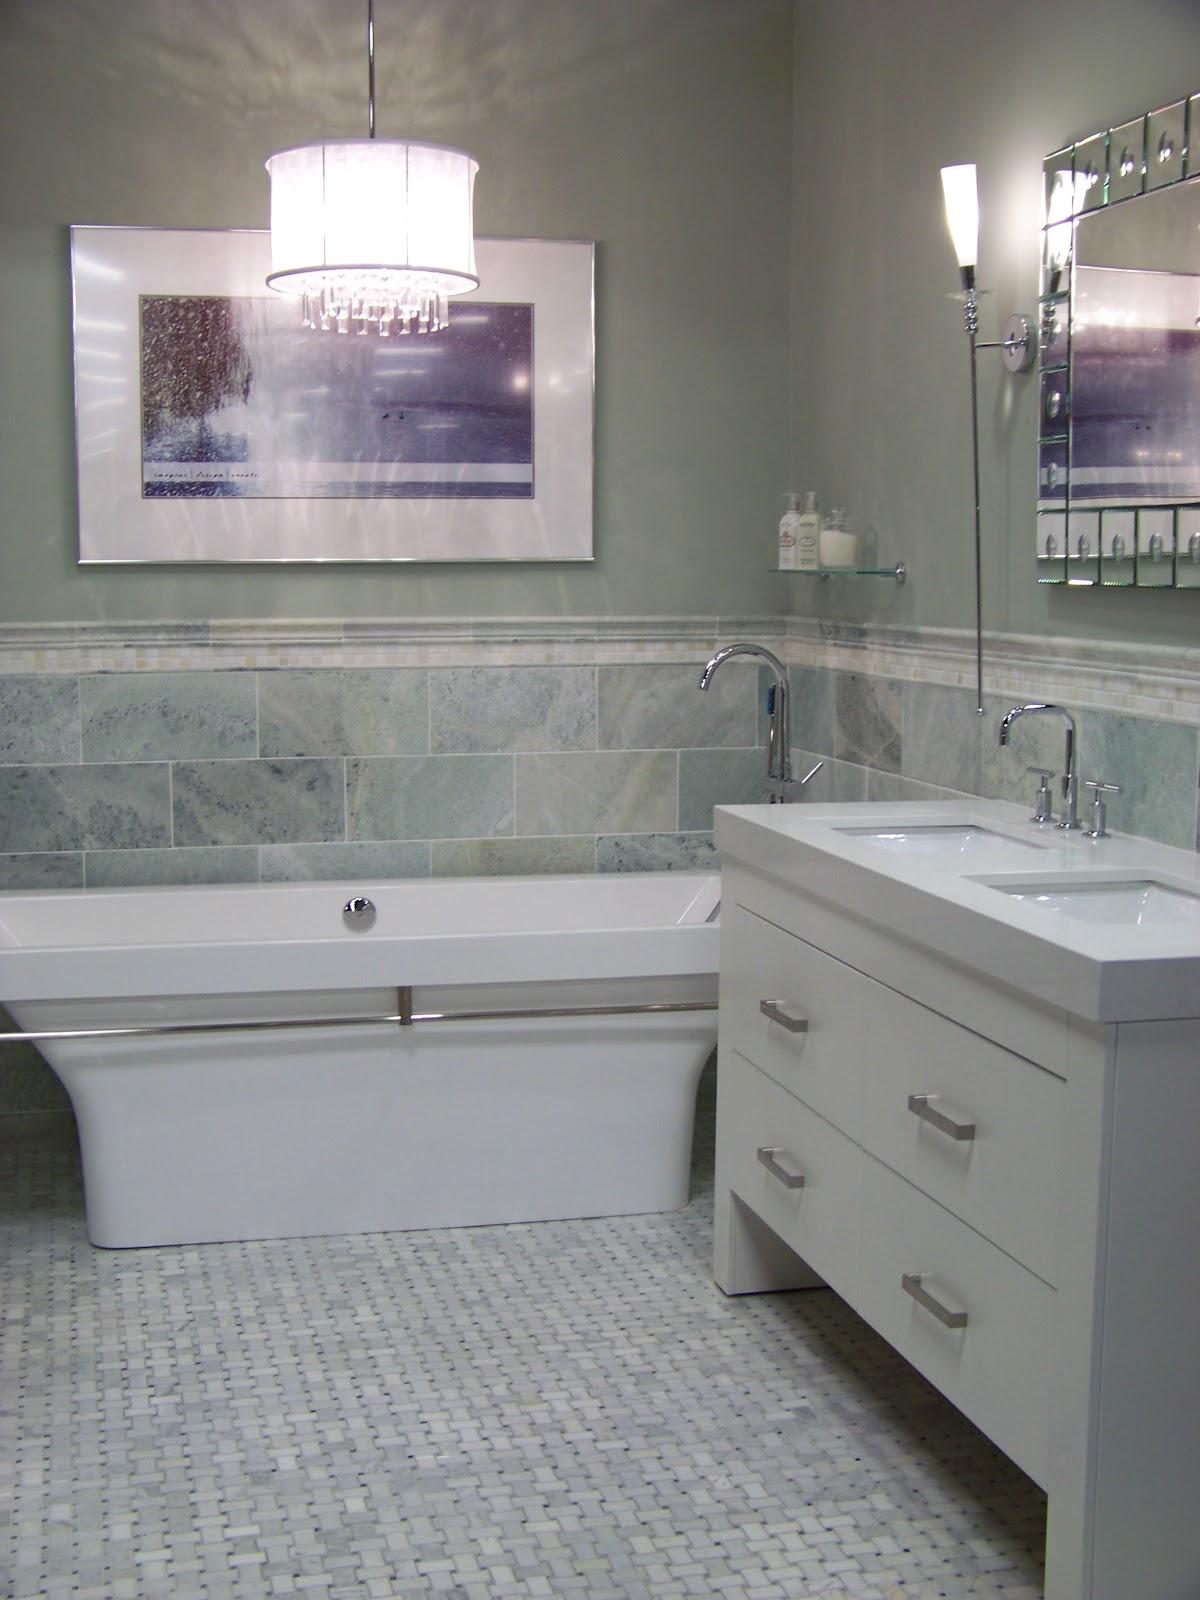 Home decor budgetista bathroom inspiration the tile shop dailygadgetfo Gallery